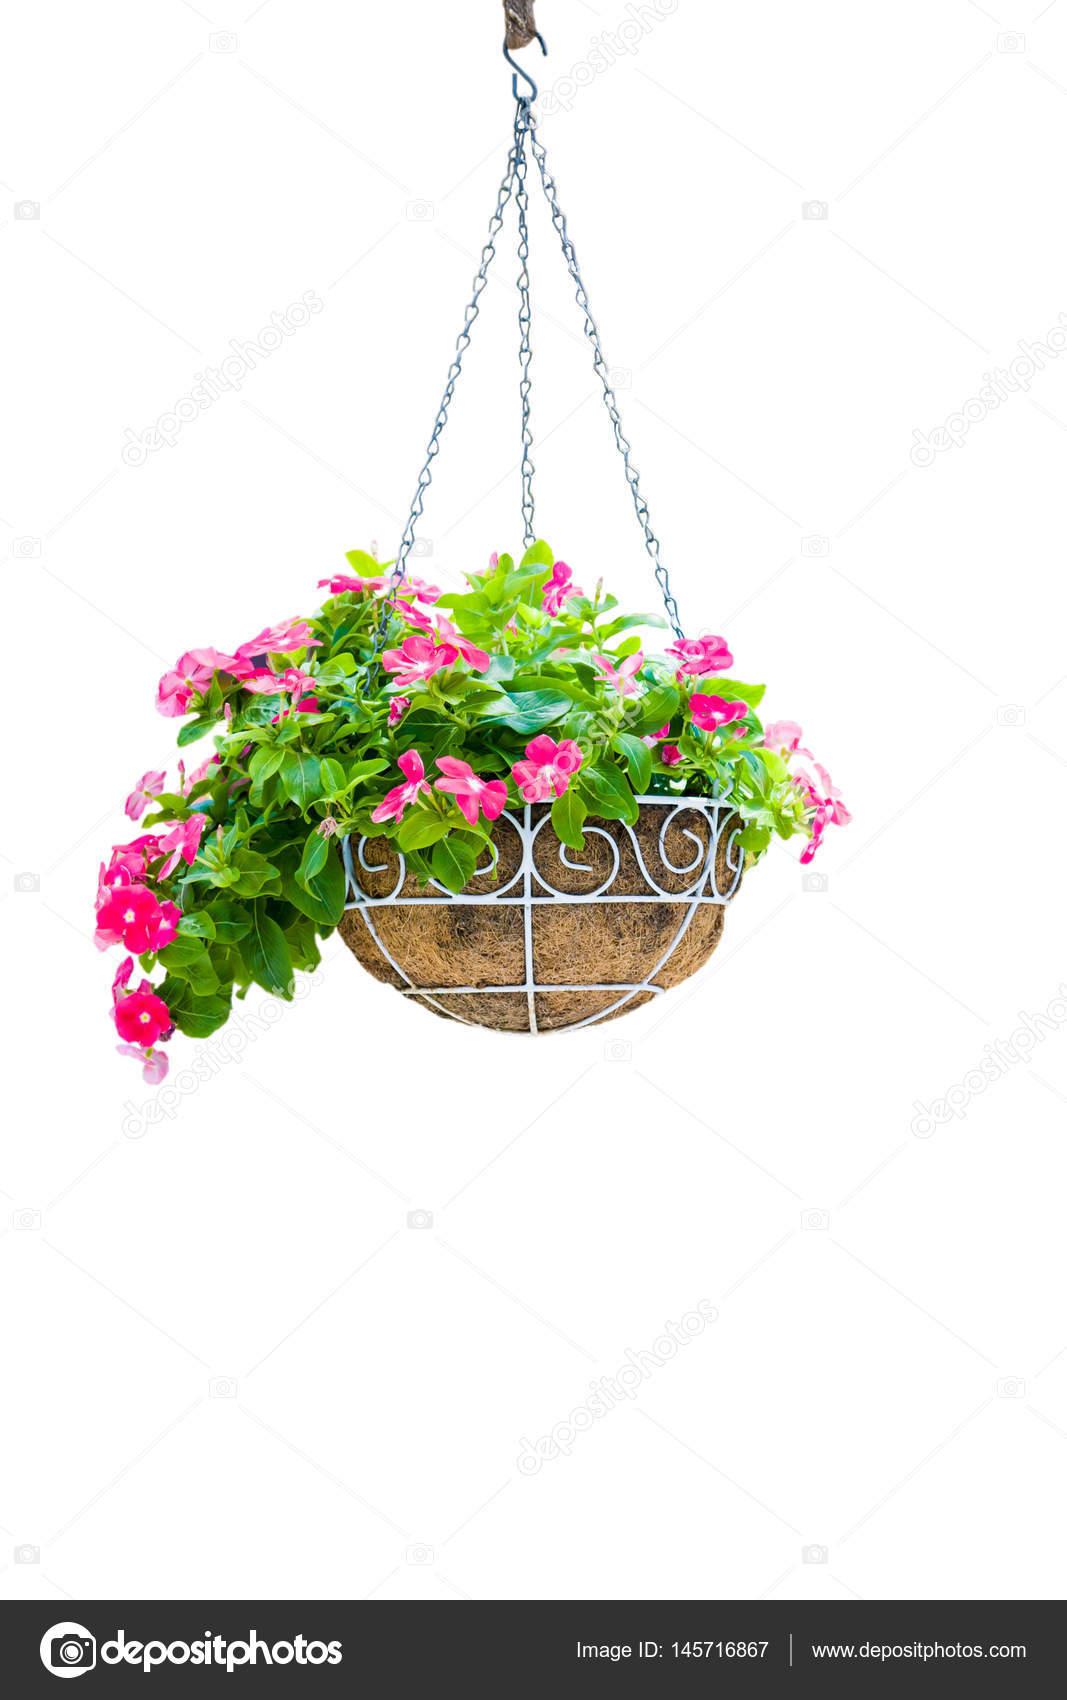 Rosa Jardinera Colgante Aislamiento En Fondo Blanco Fotos De Stock - Jardinera-colgante